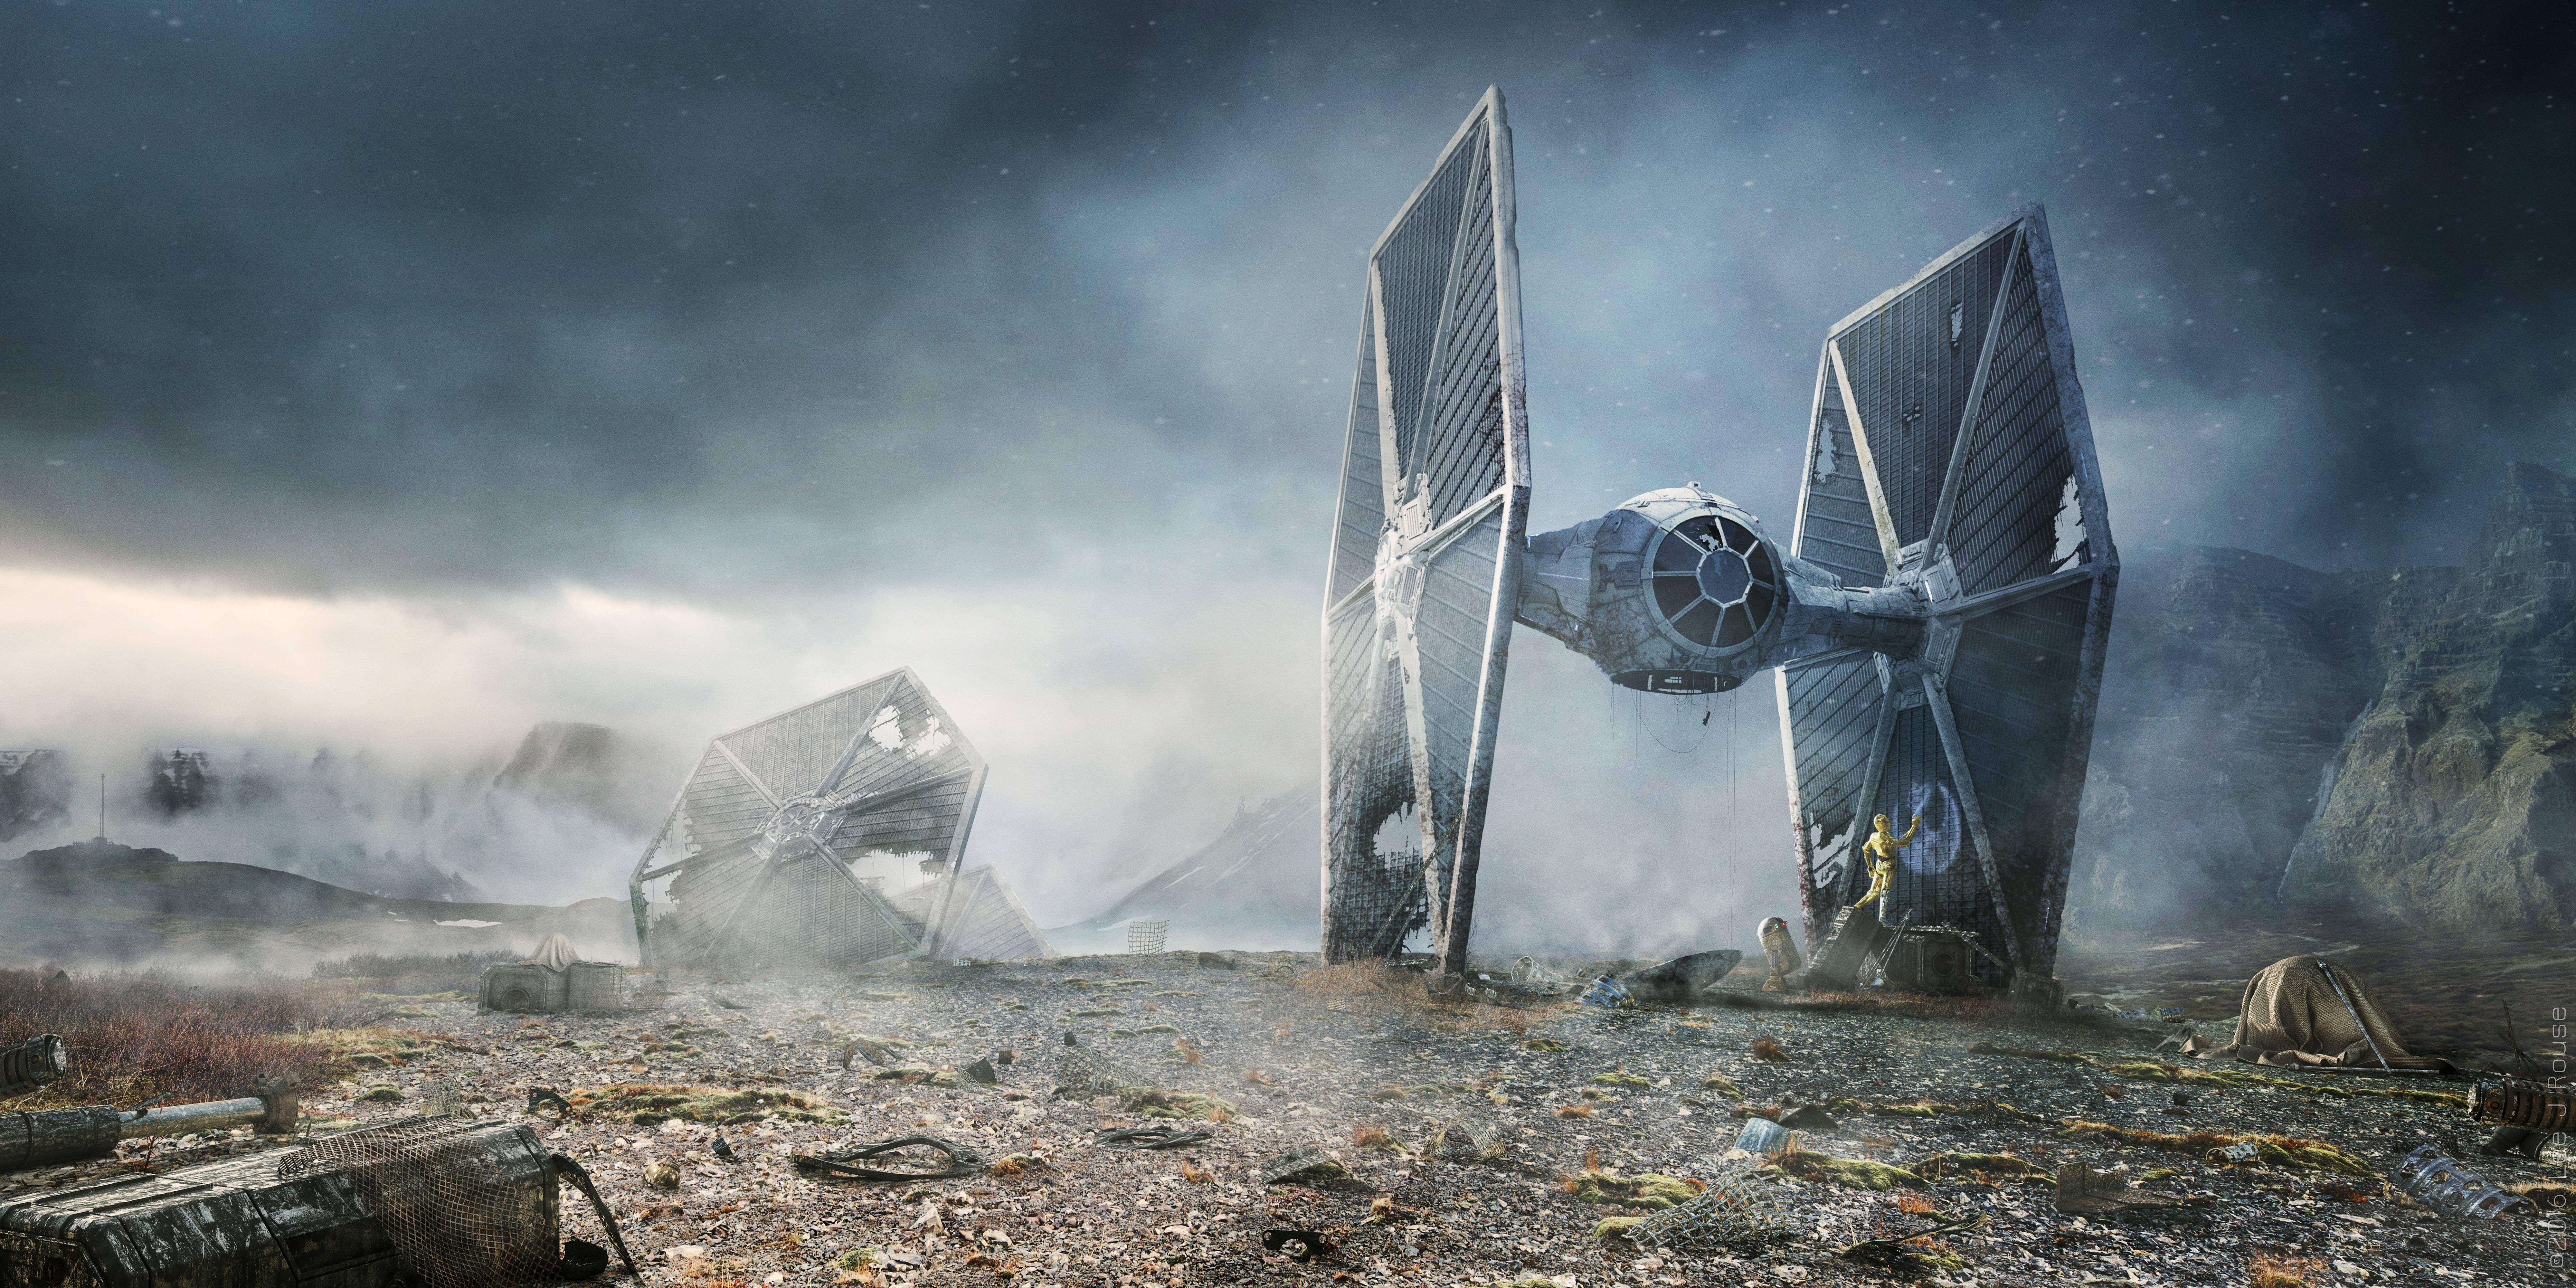 Pin By Estefan Richter On Film Star Wars Wallpaper Tie Fighter Wallpaper Star Wars Background